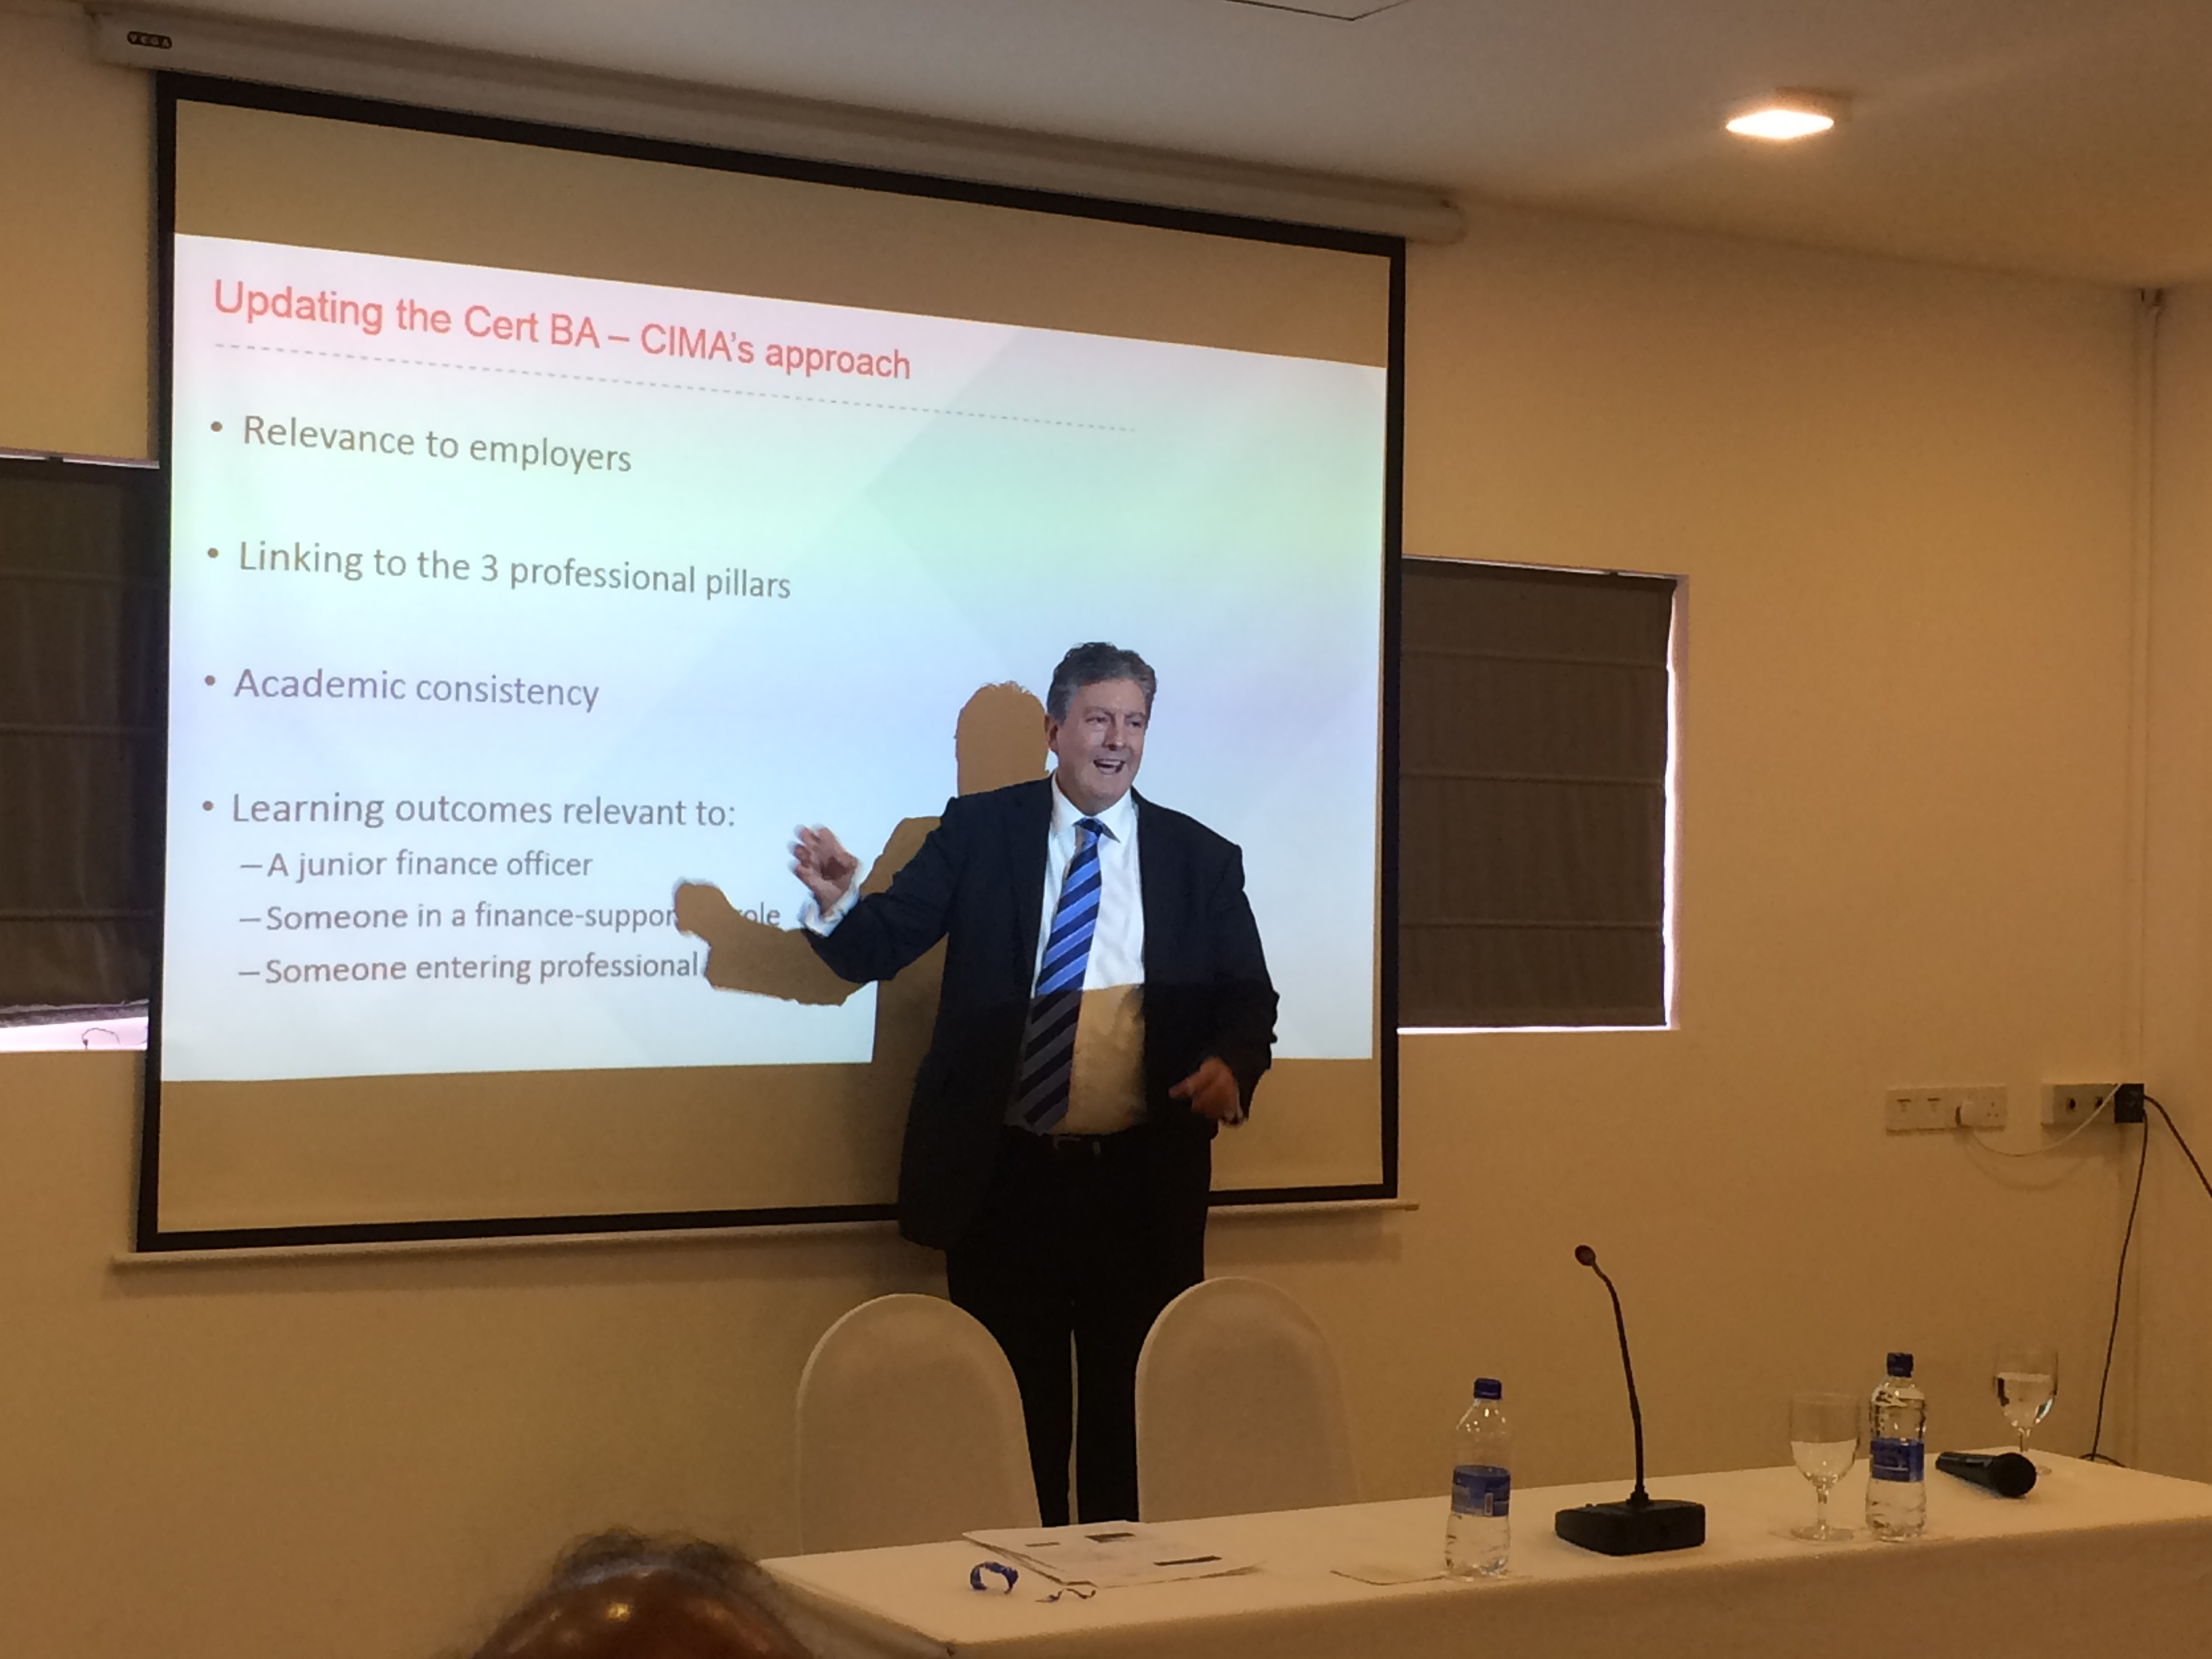 presentation topics in finance officer